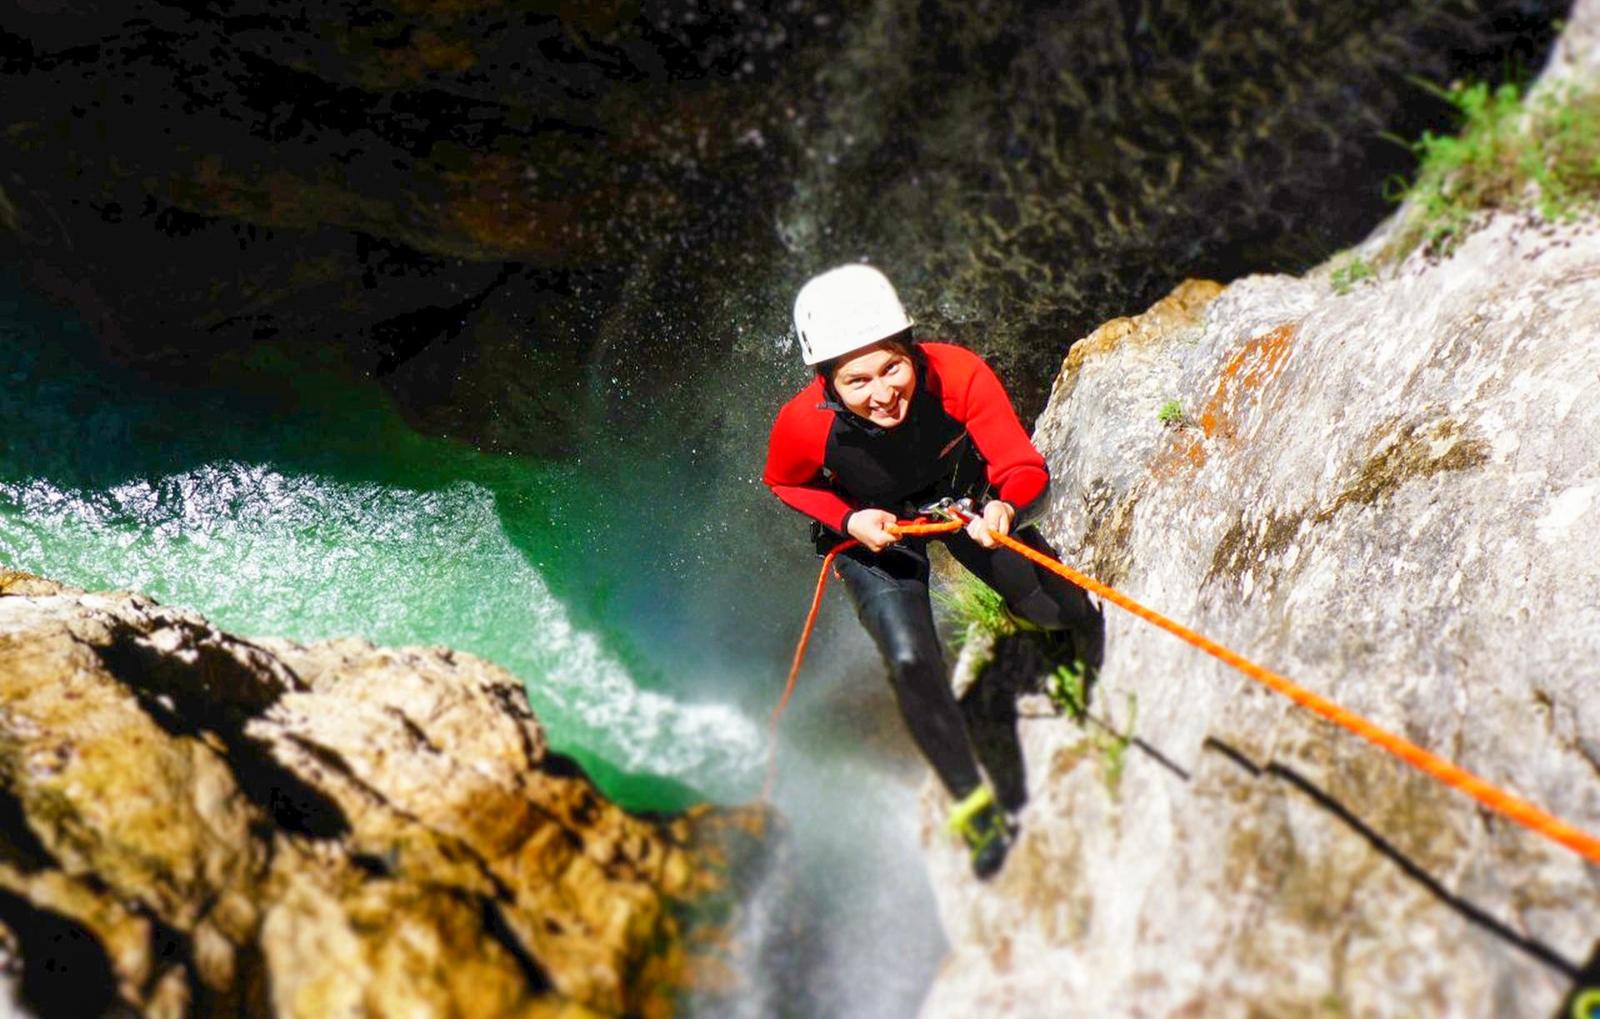 canyoning-tour-schneizlreuth-bg1